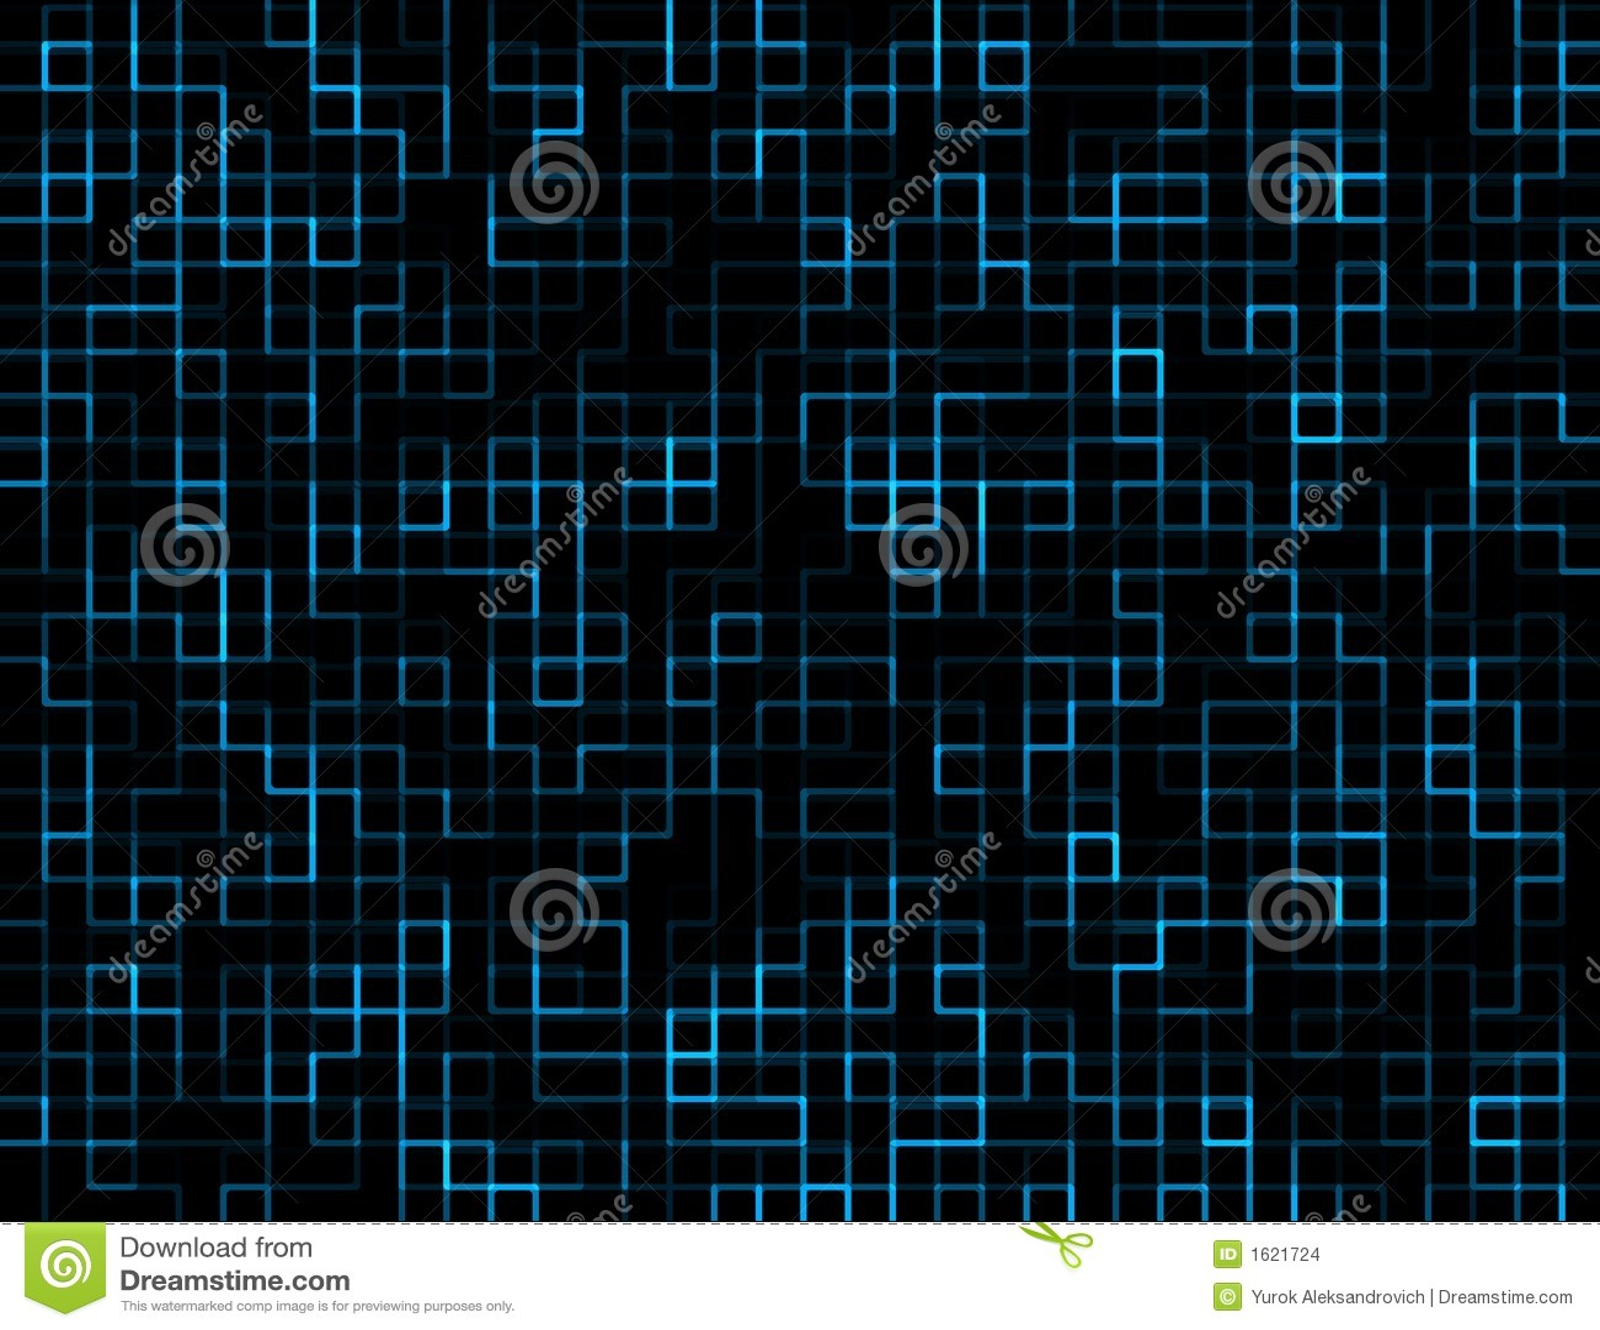 techno style background stock illustration illustration